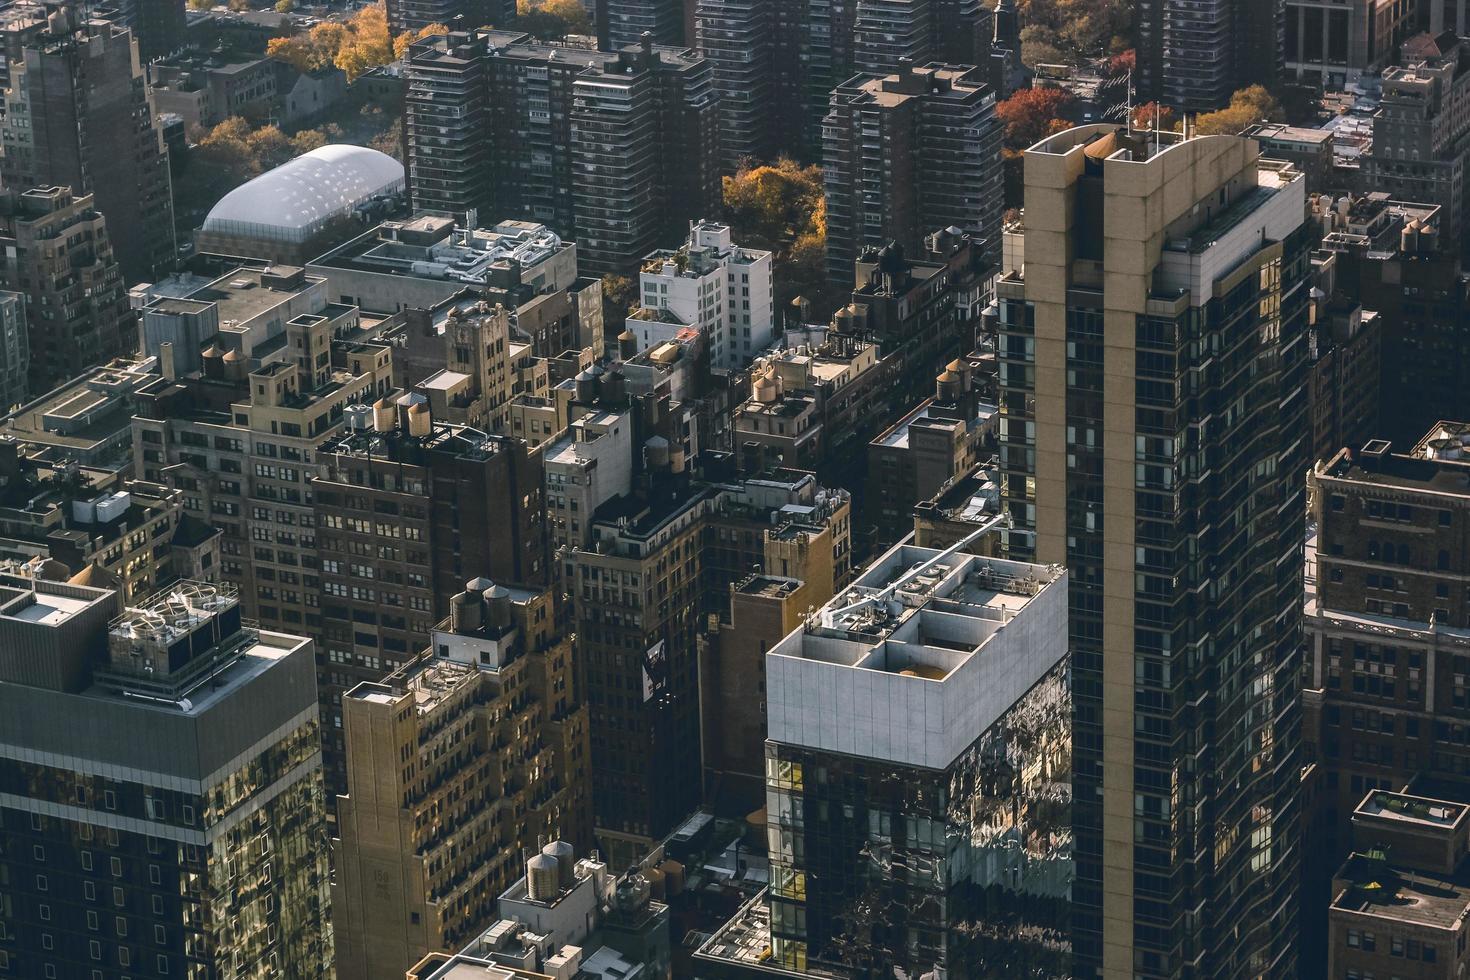 City during daytime photo